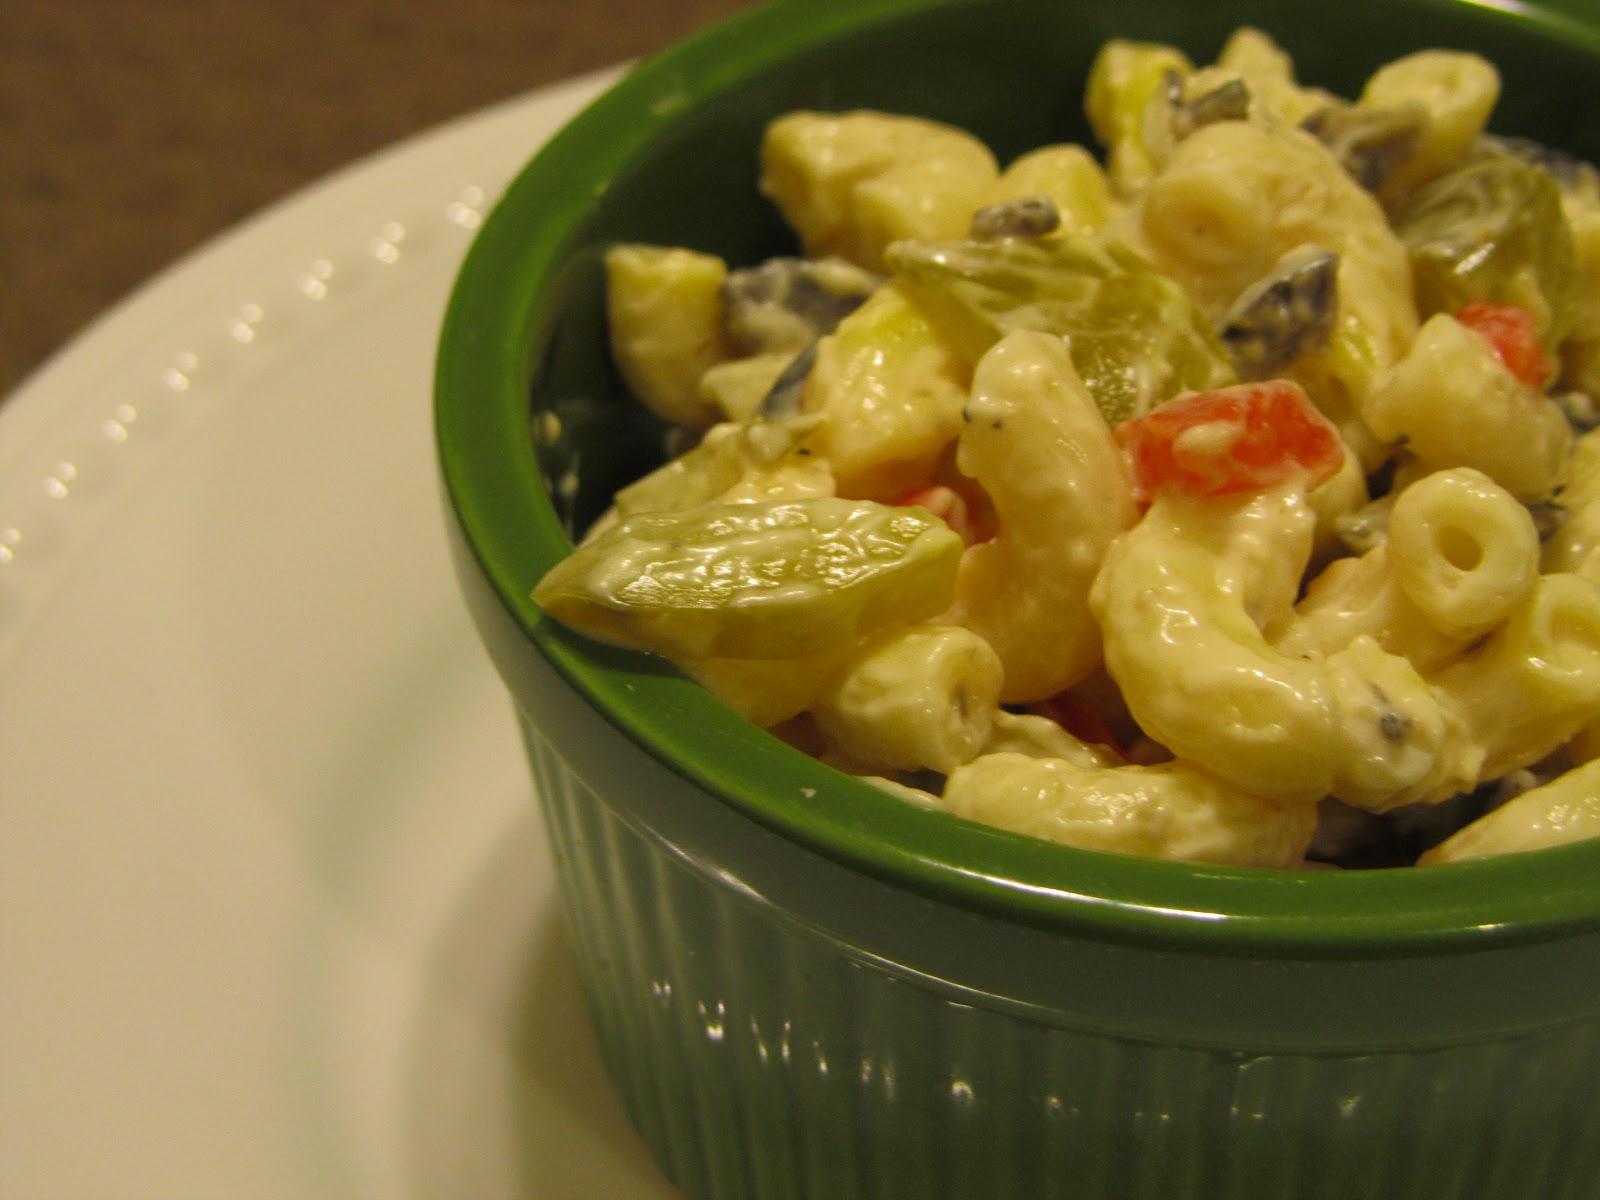 Enter: the best macaroni salad ever.